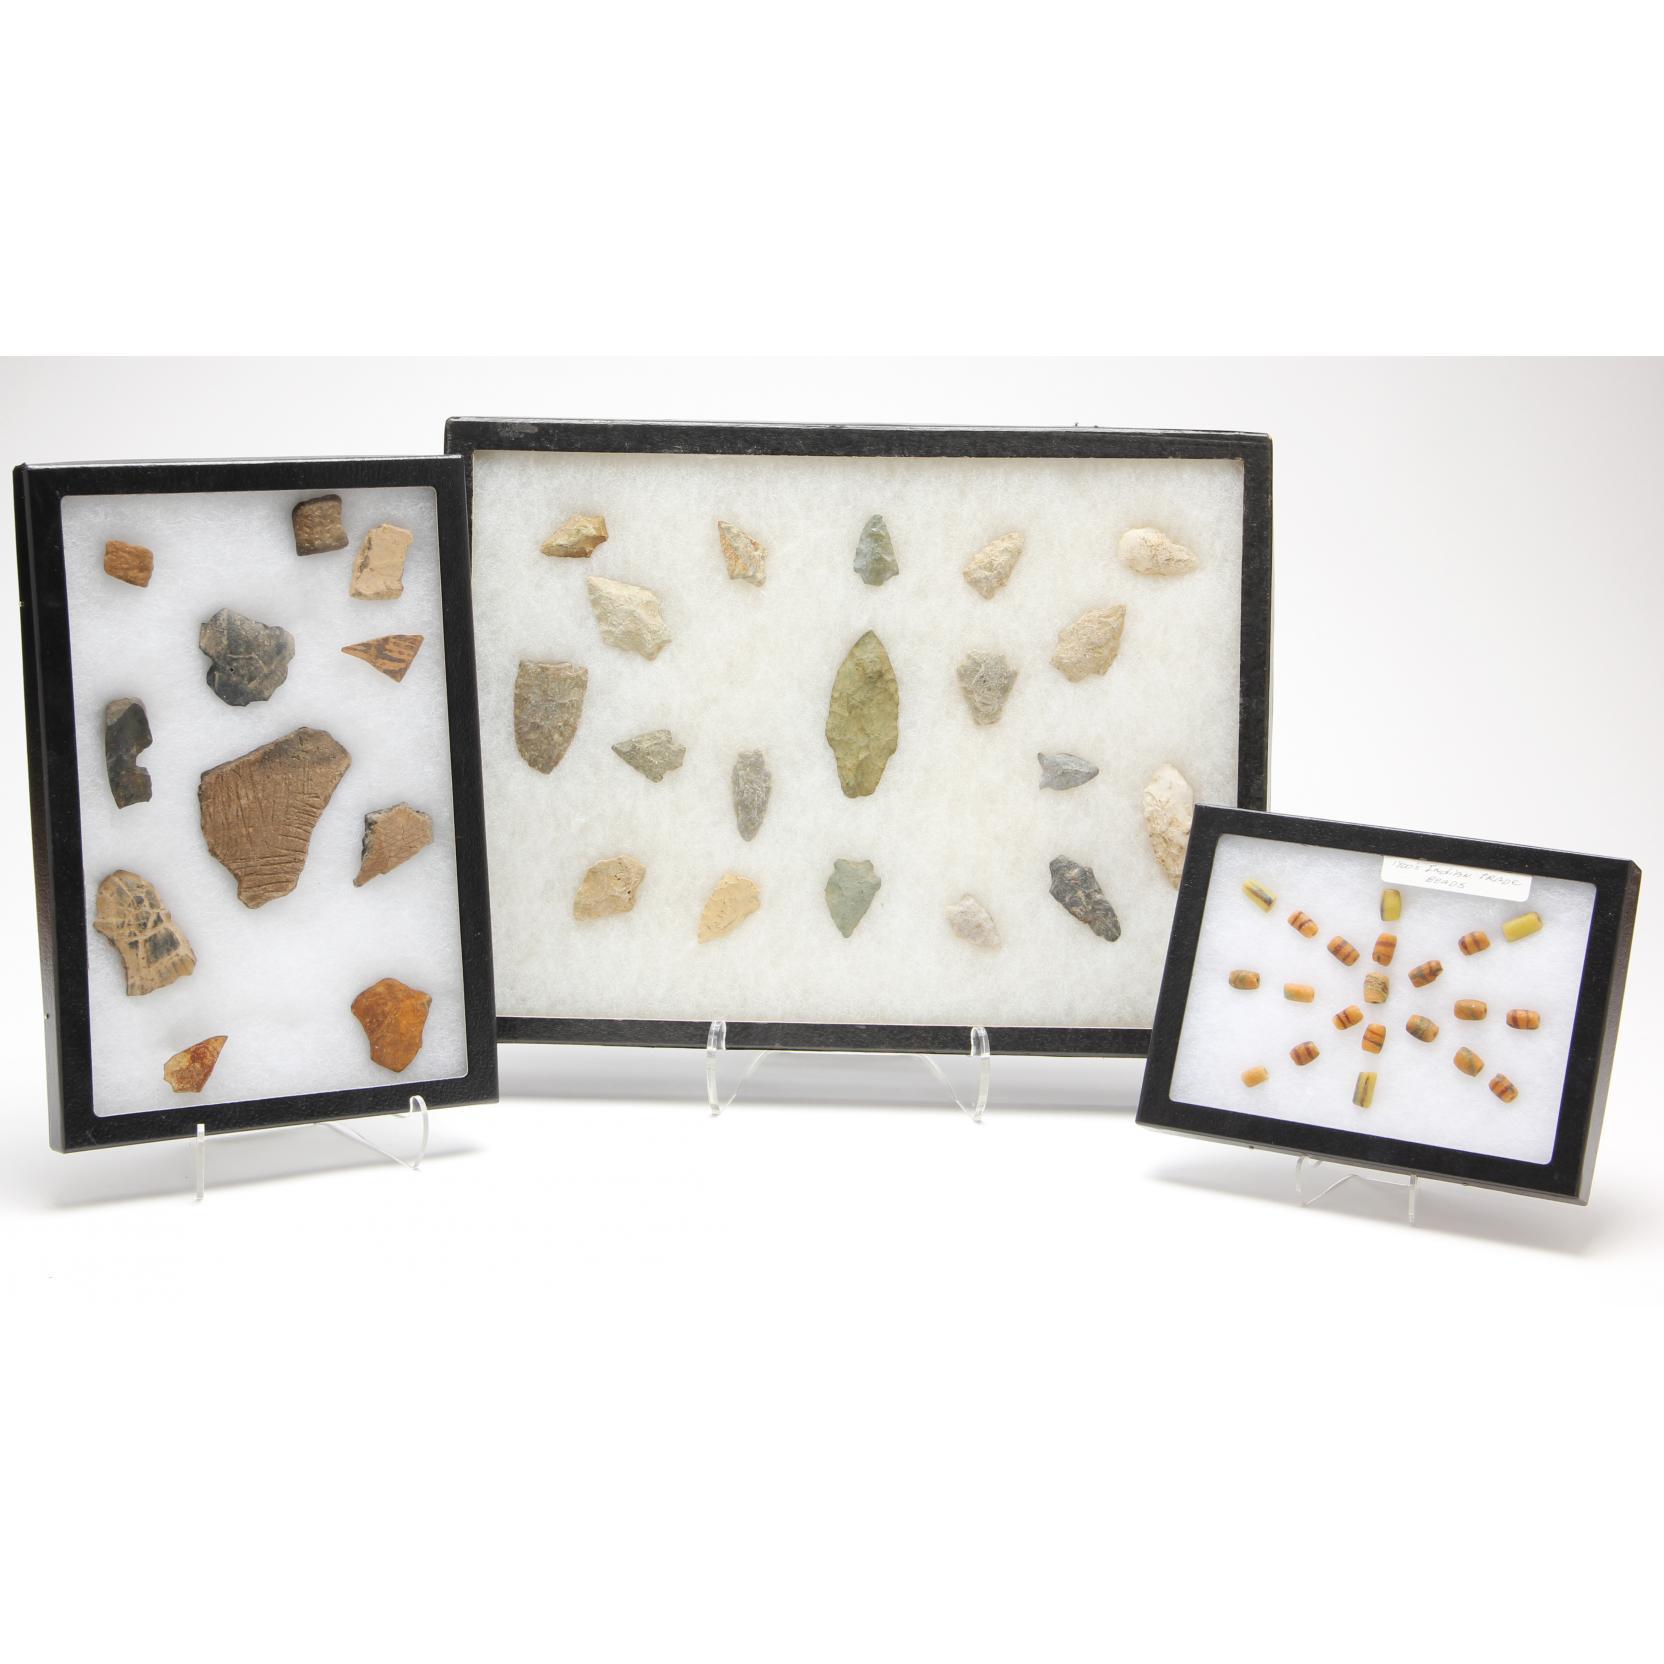 three-riker-mounts-of-indian-artifacts